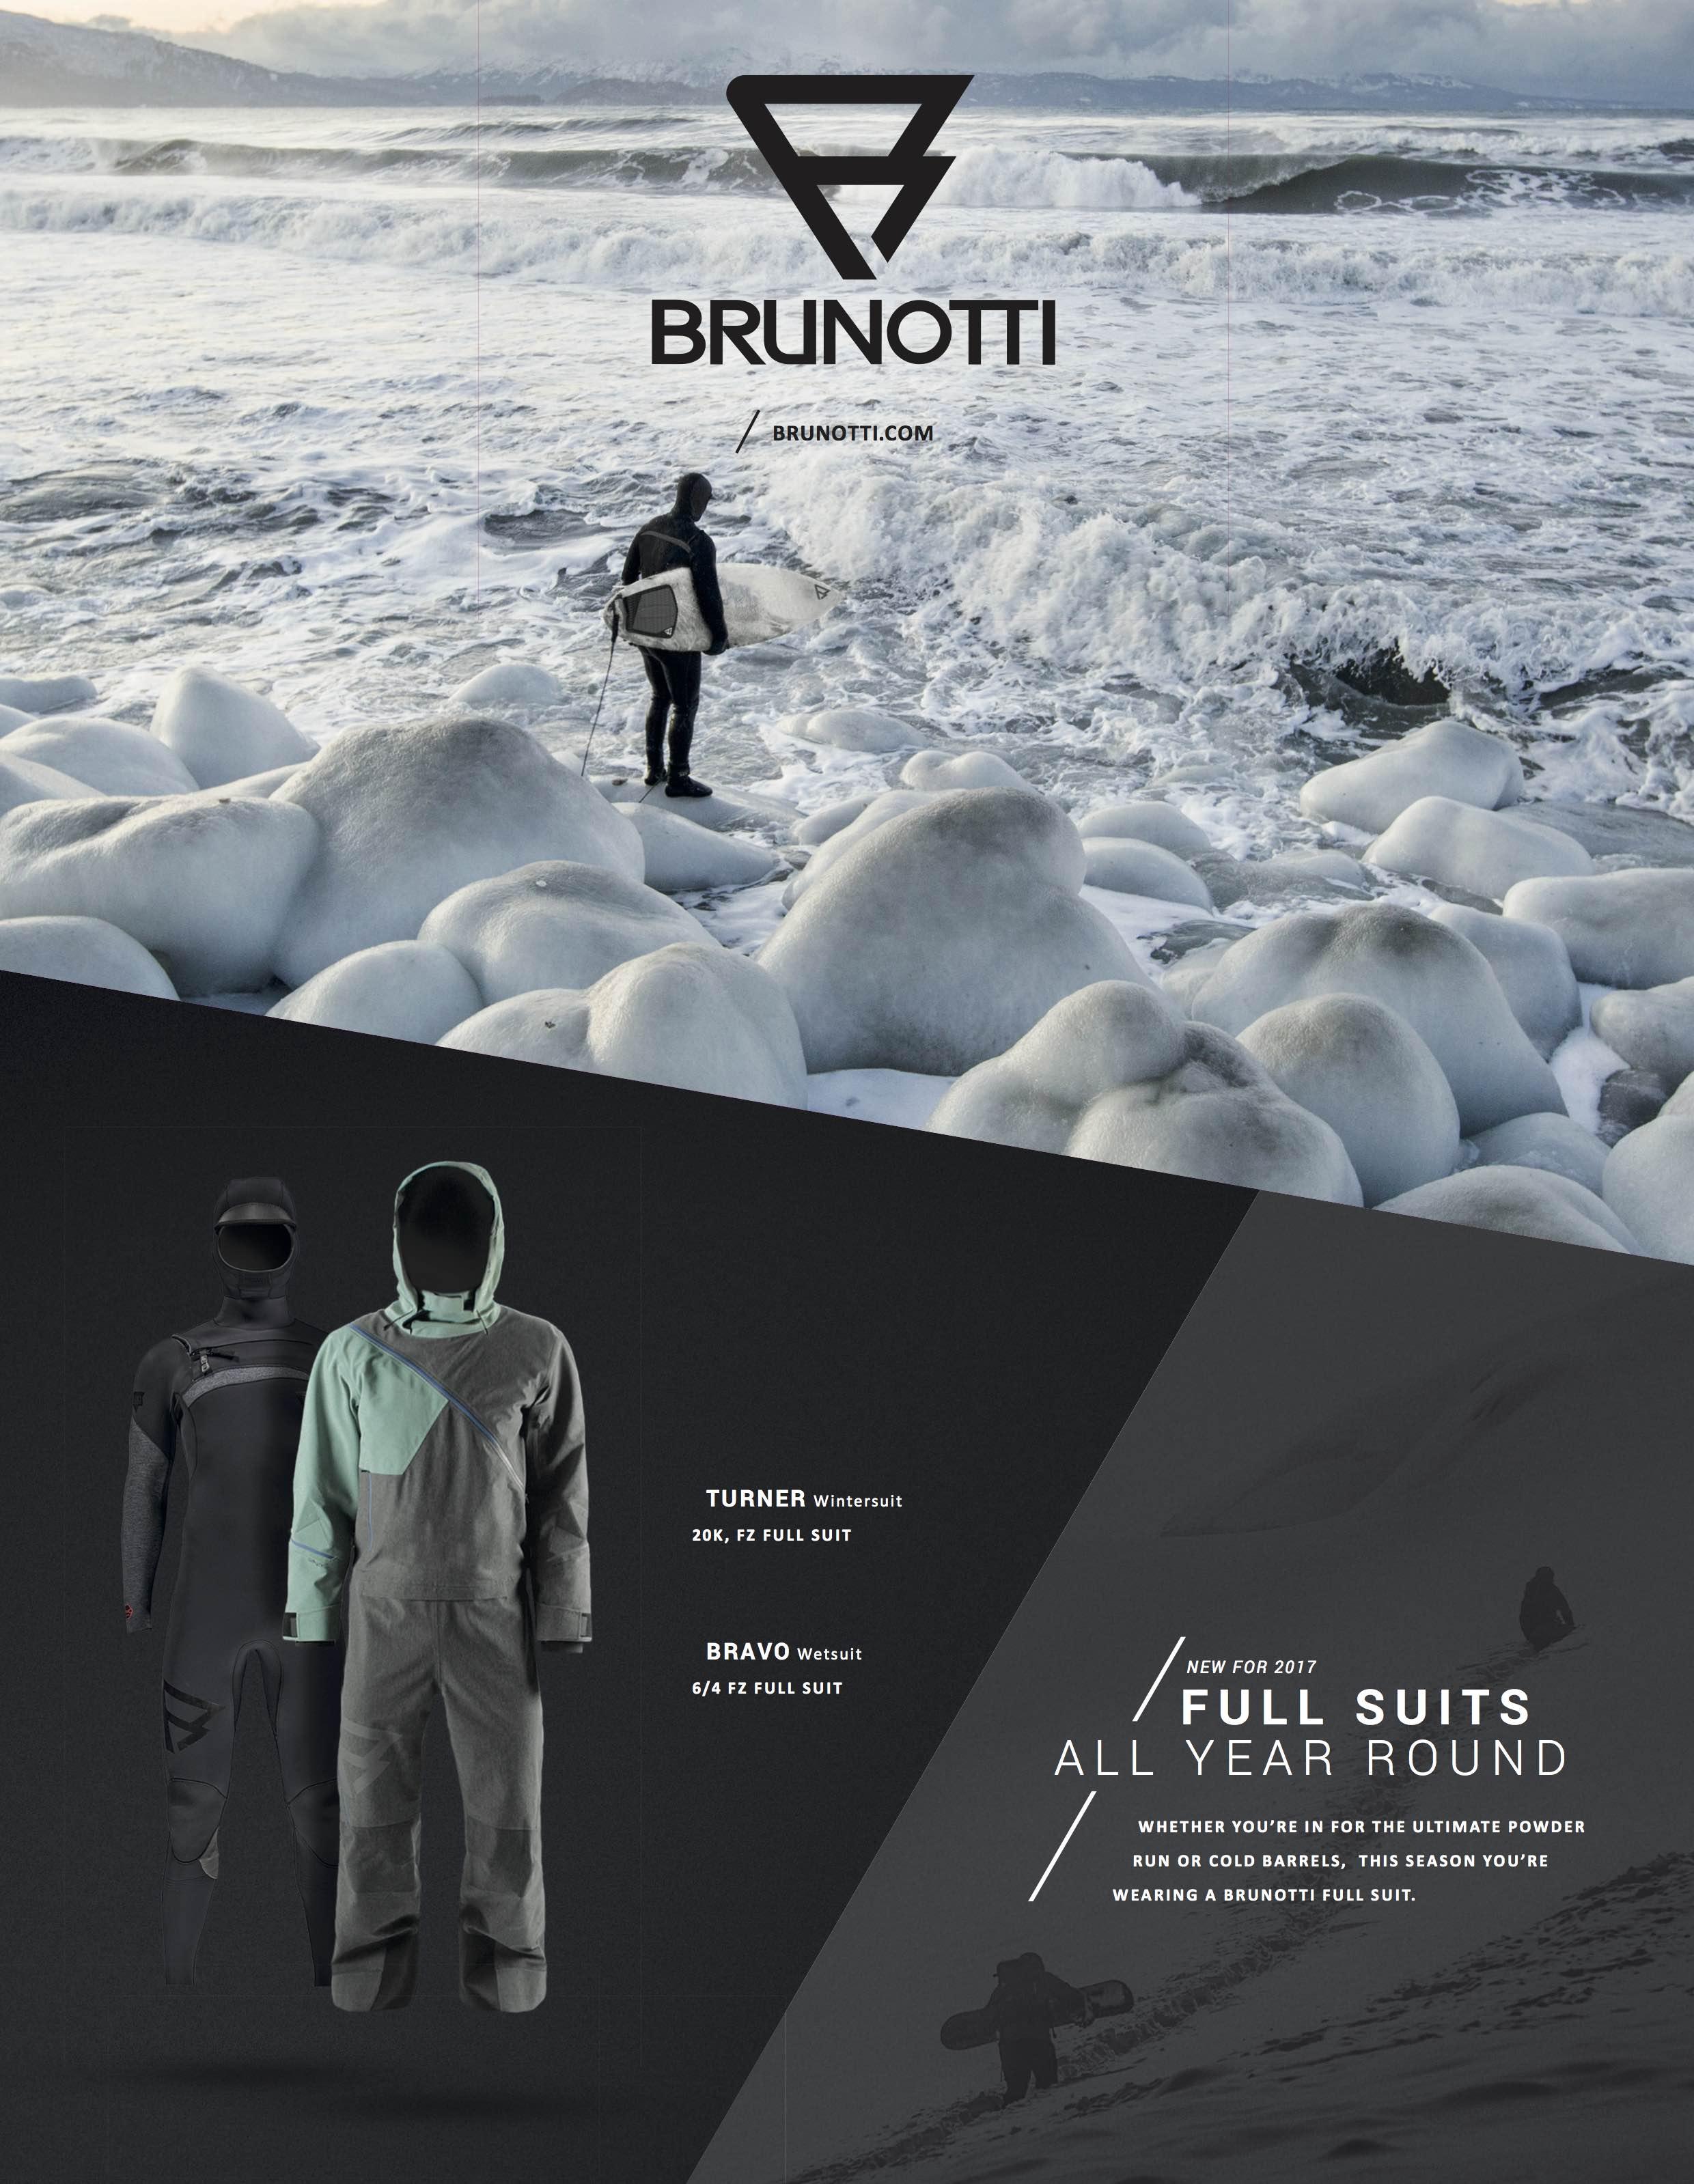 84 Brunotti SURF